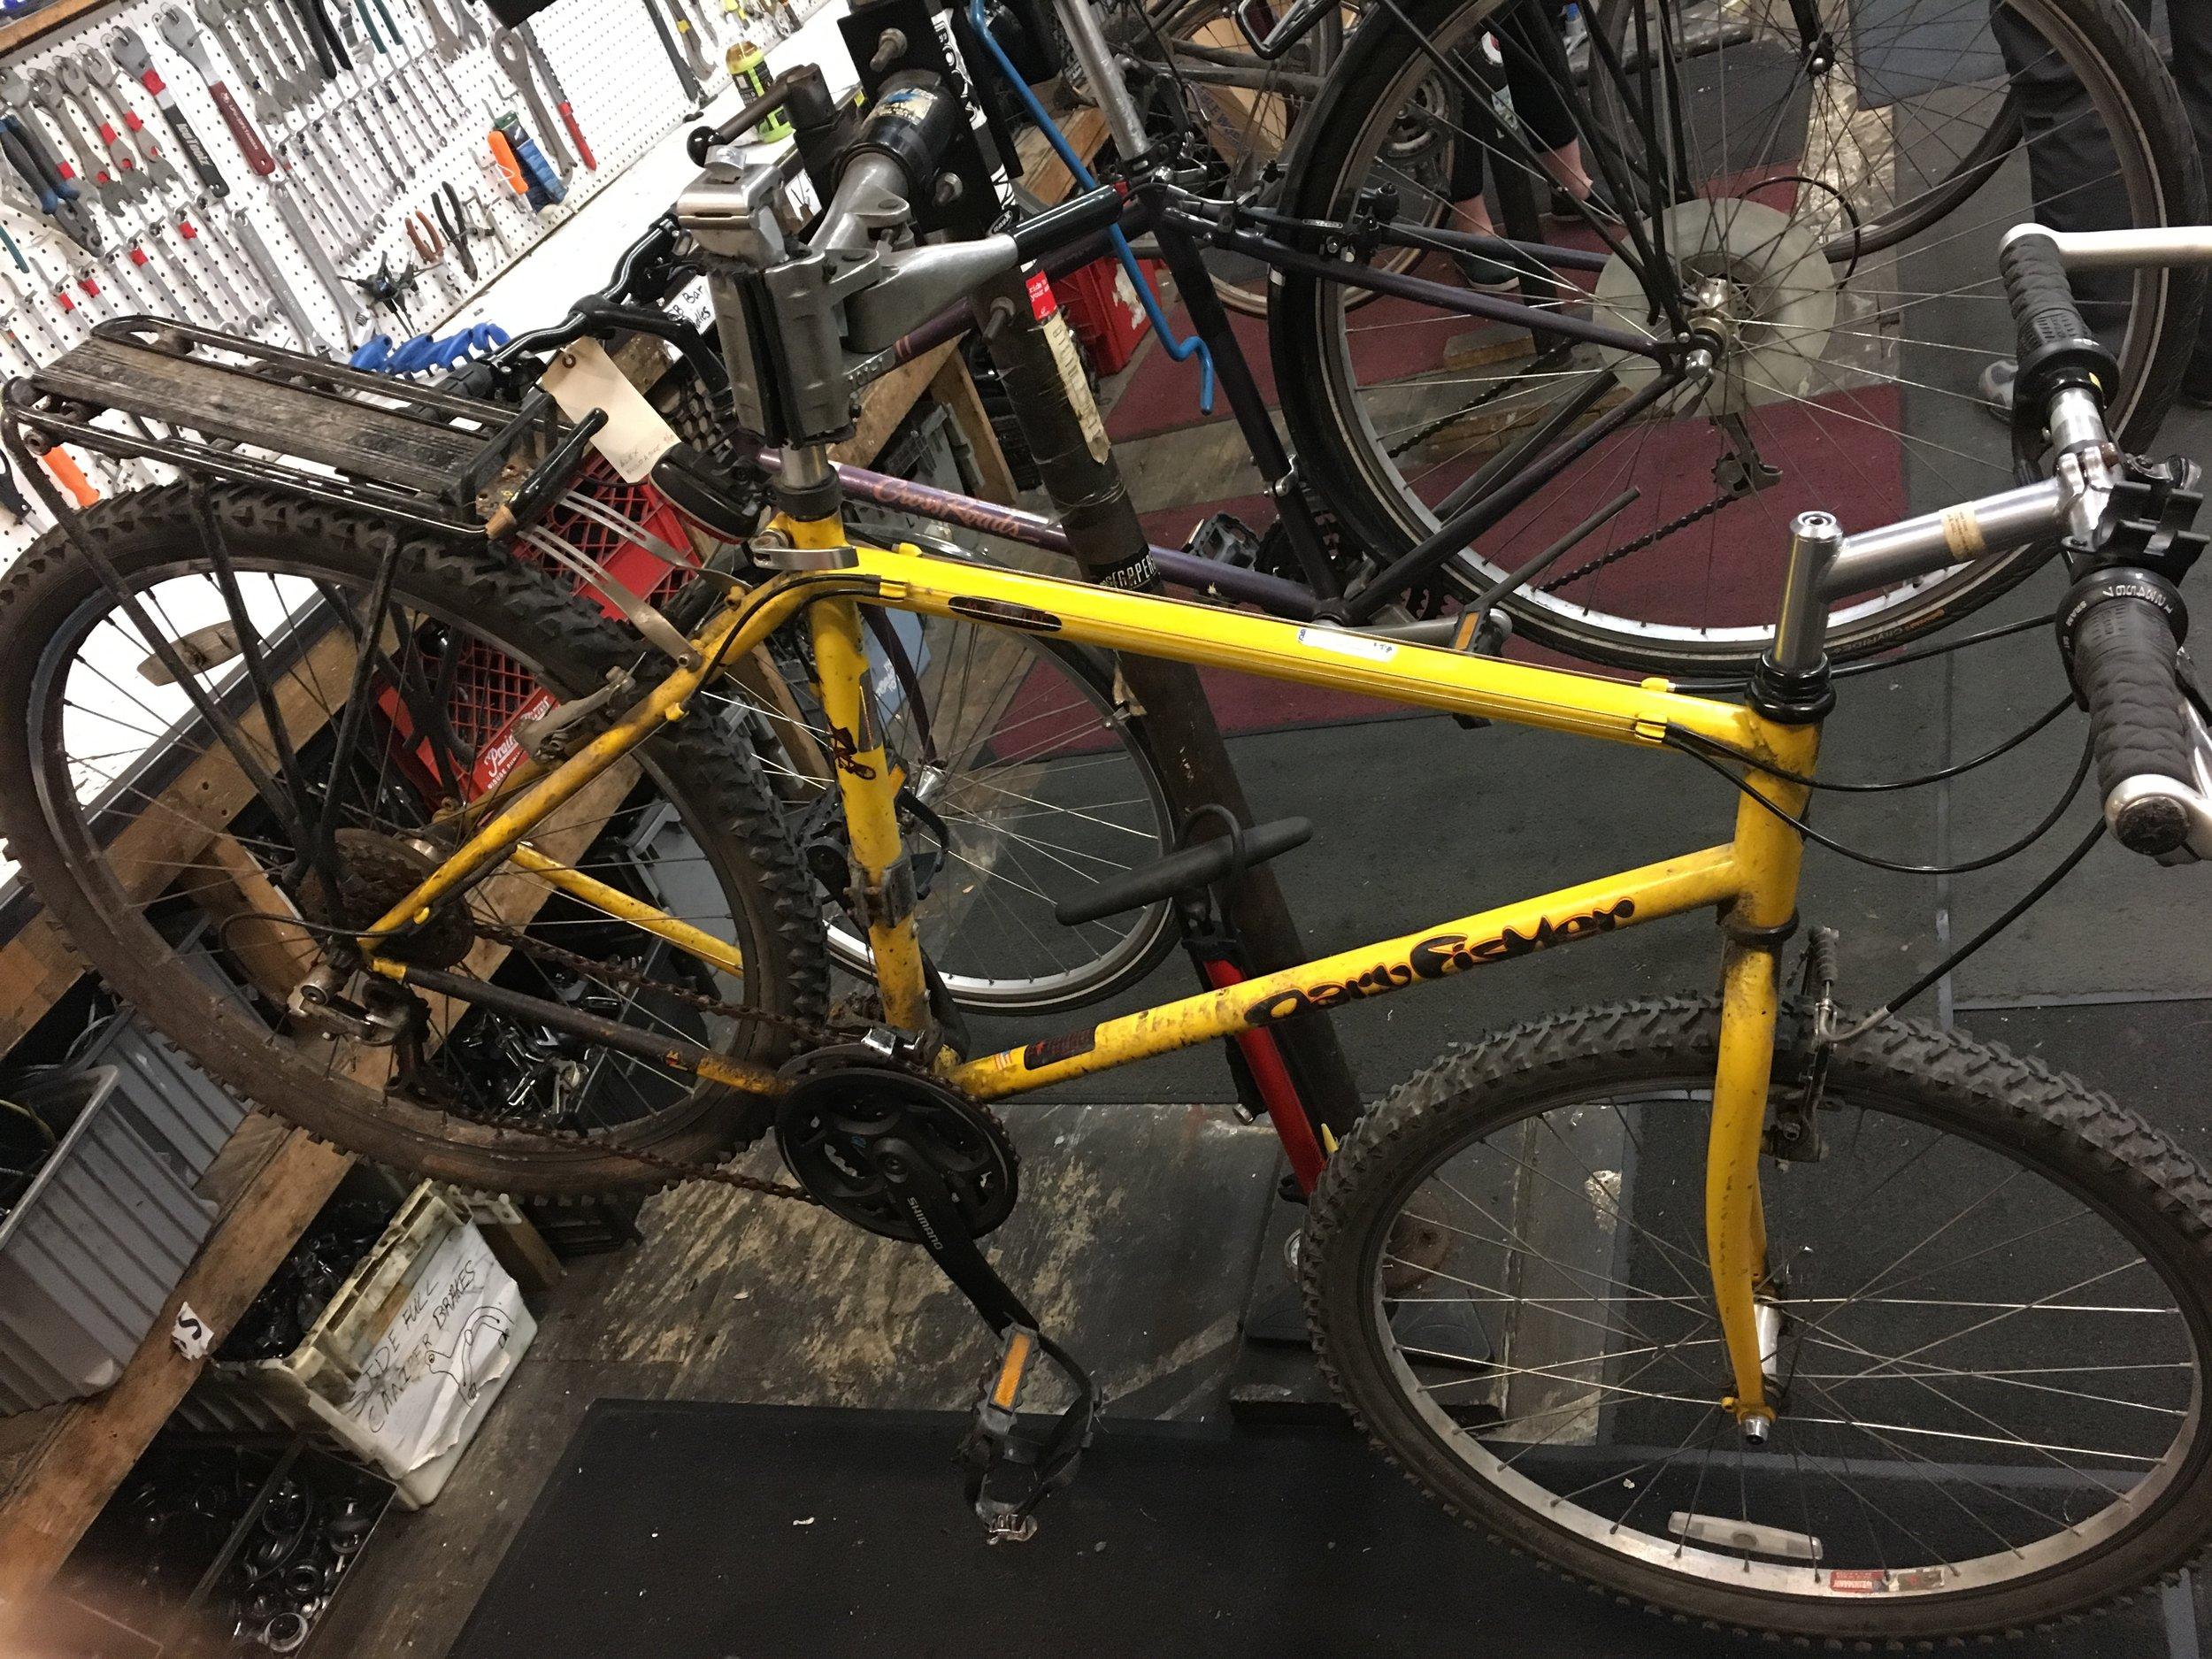 mcul's winter project bike